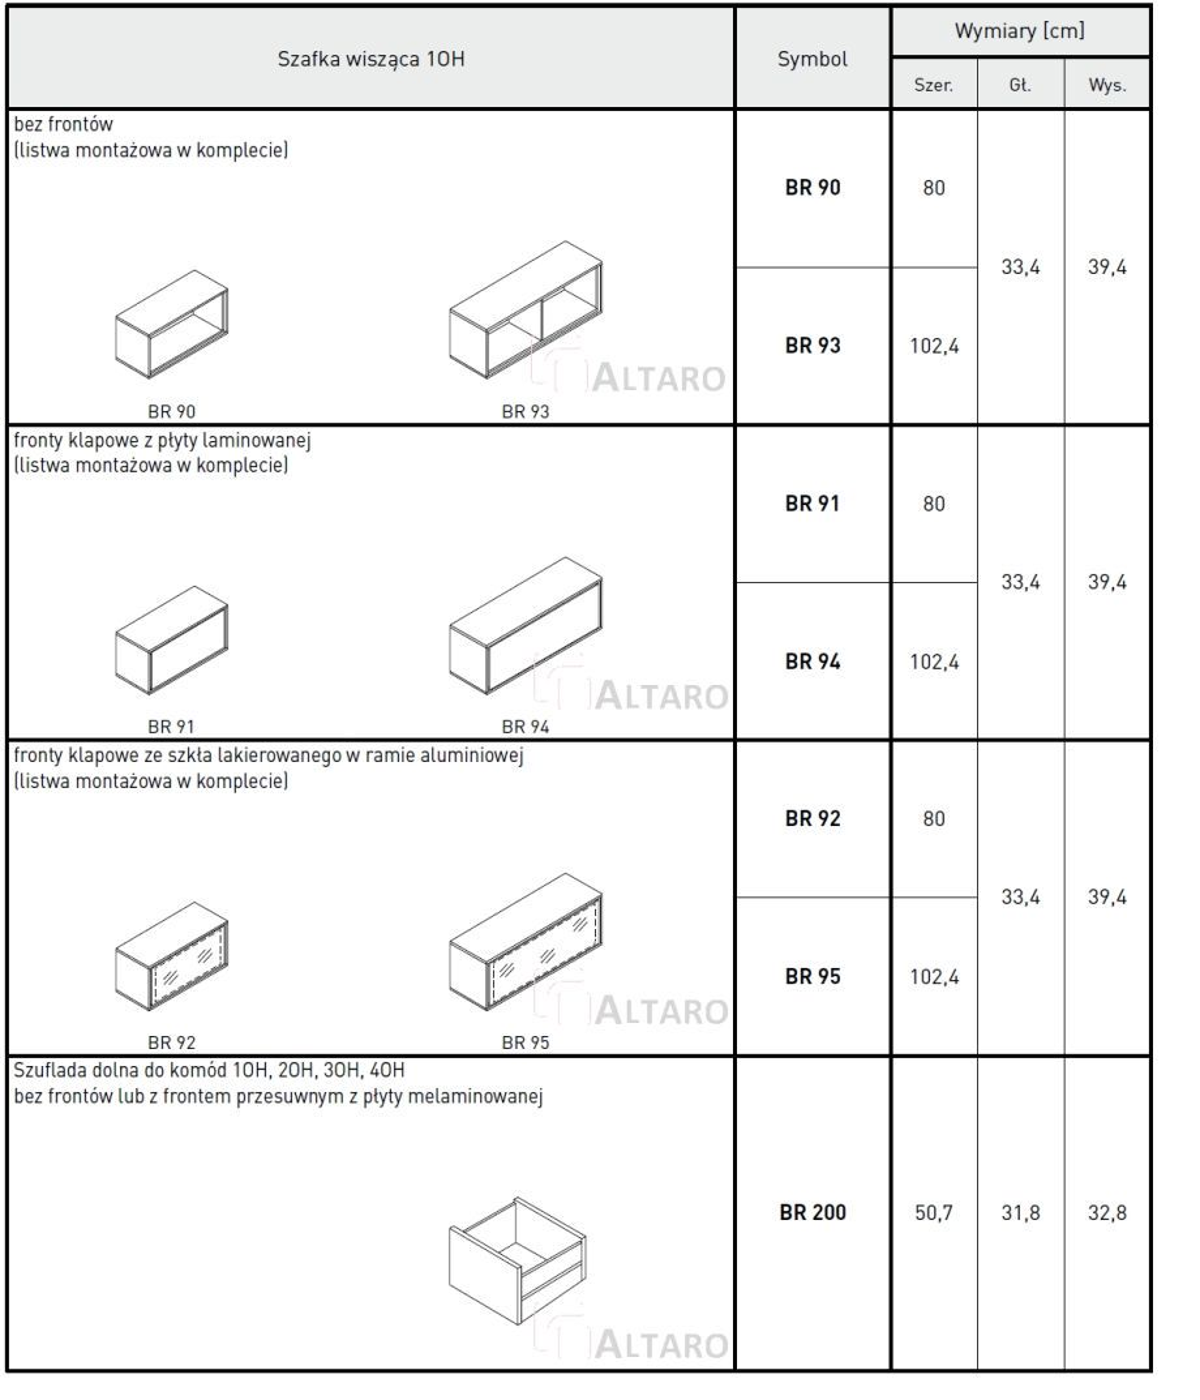 meble gabinetowe BRAND katalog v13 ALTARO